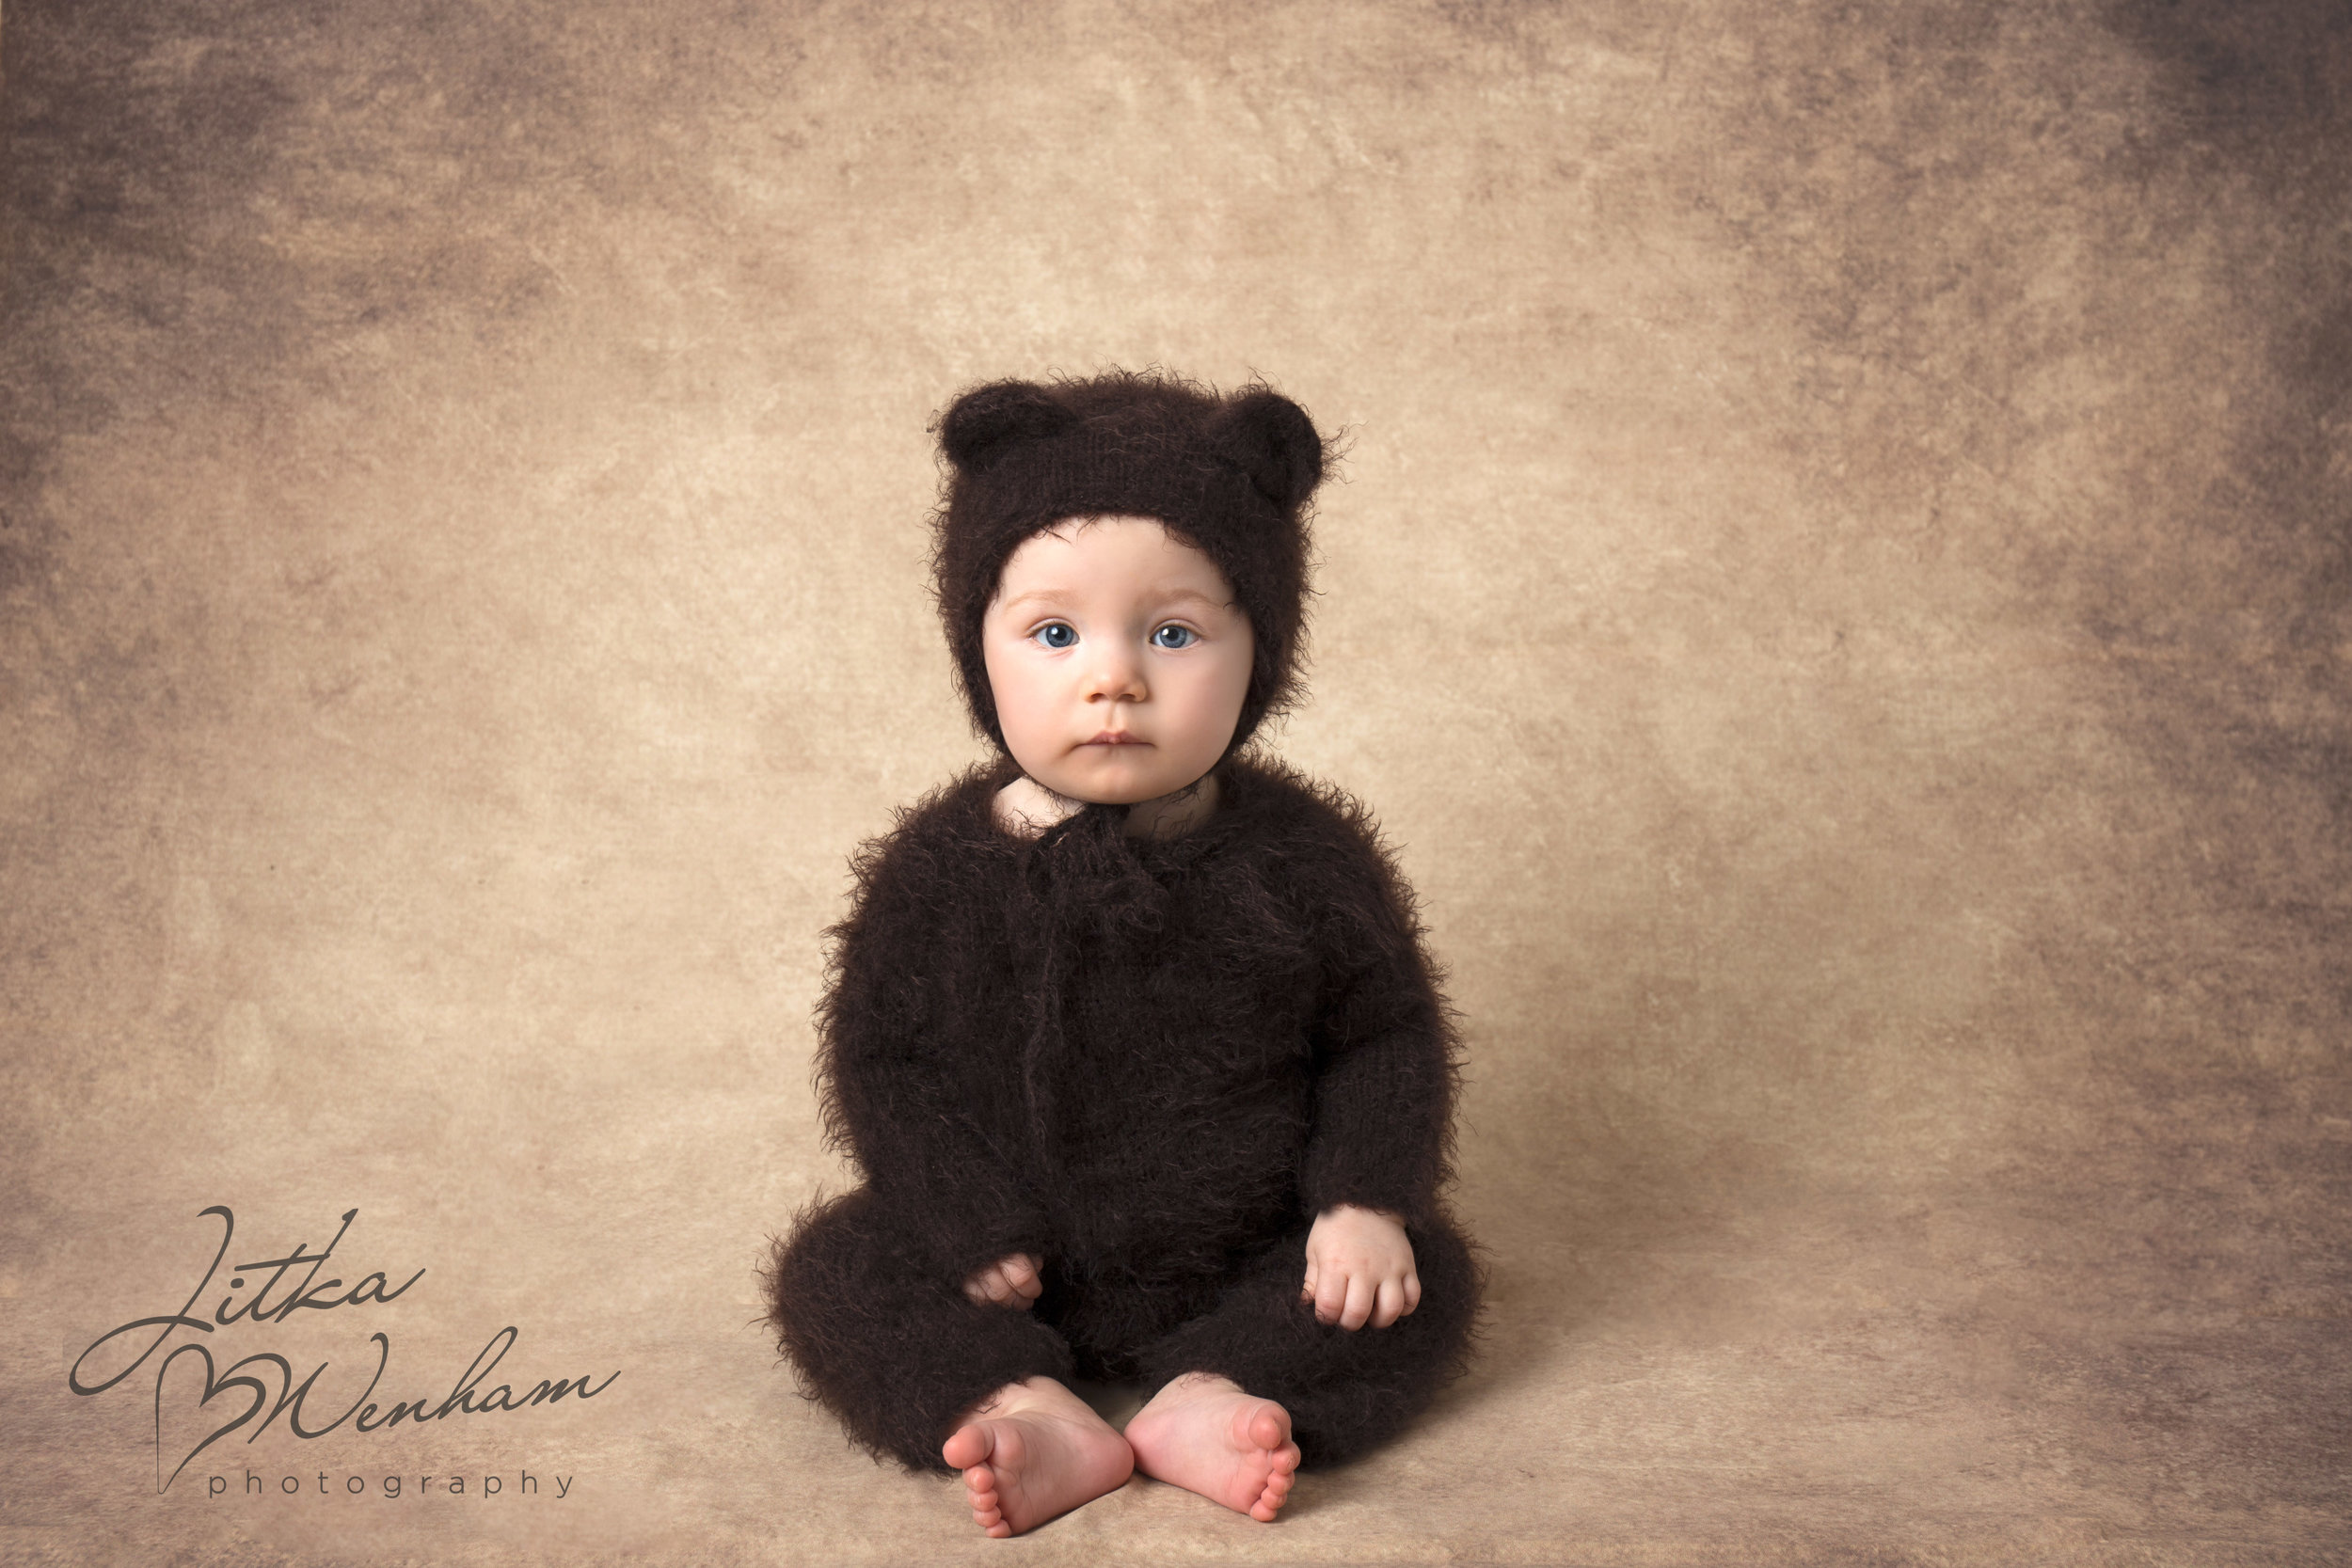 newborn-photography-children-baby-milton keynes-cake-smash-1-6.jpg